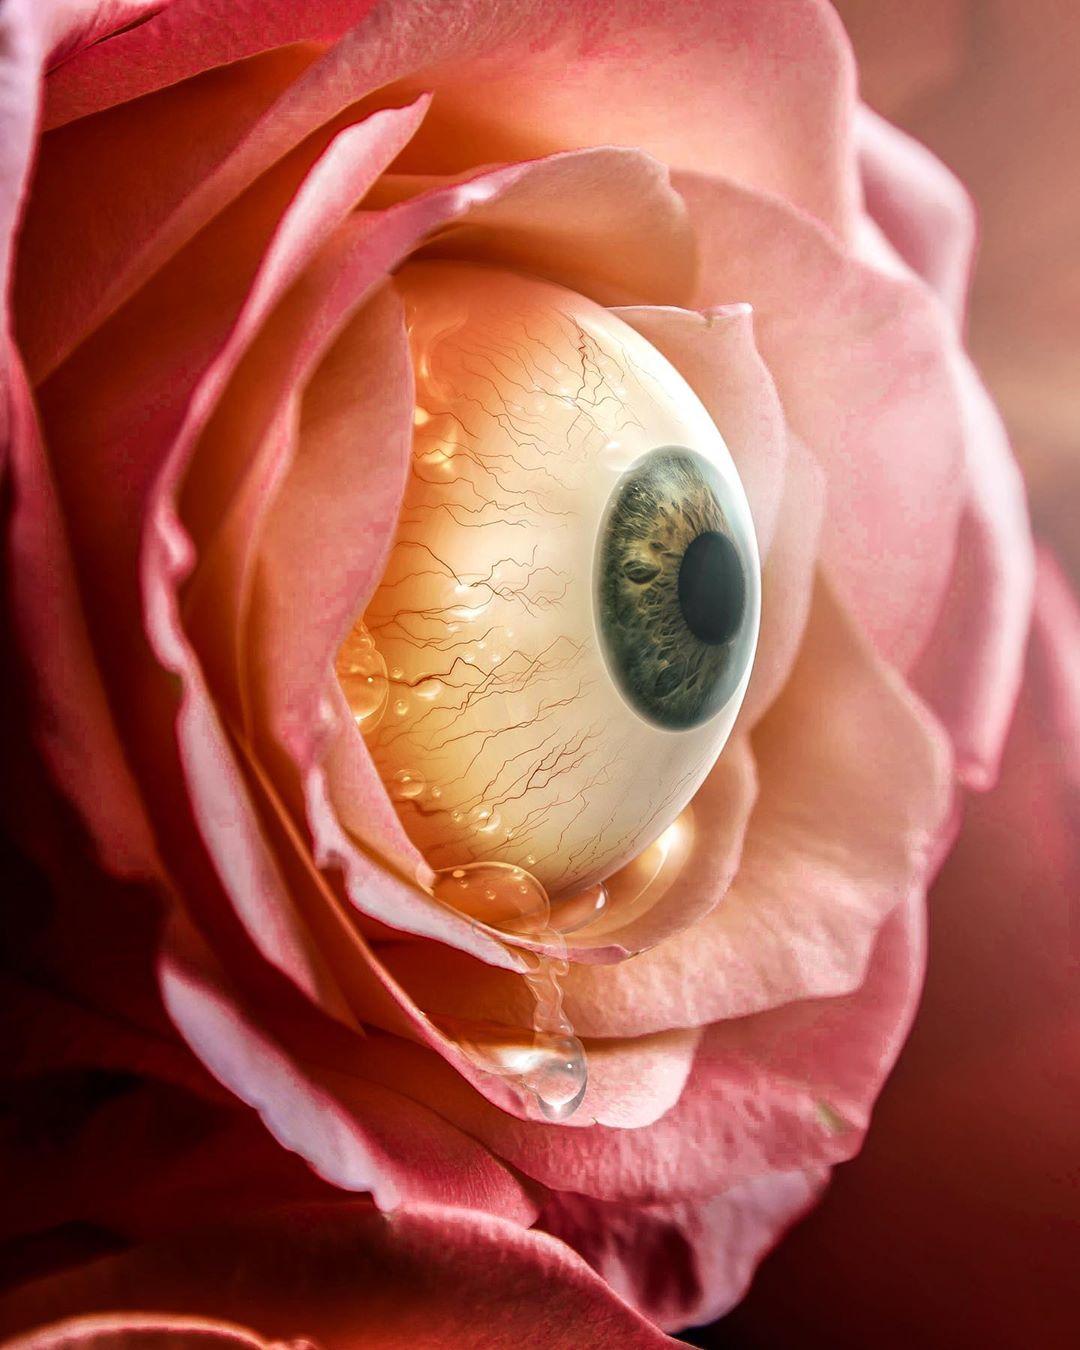 Crying Flower by Shaun Ryken